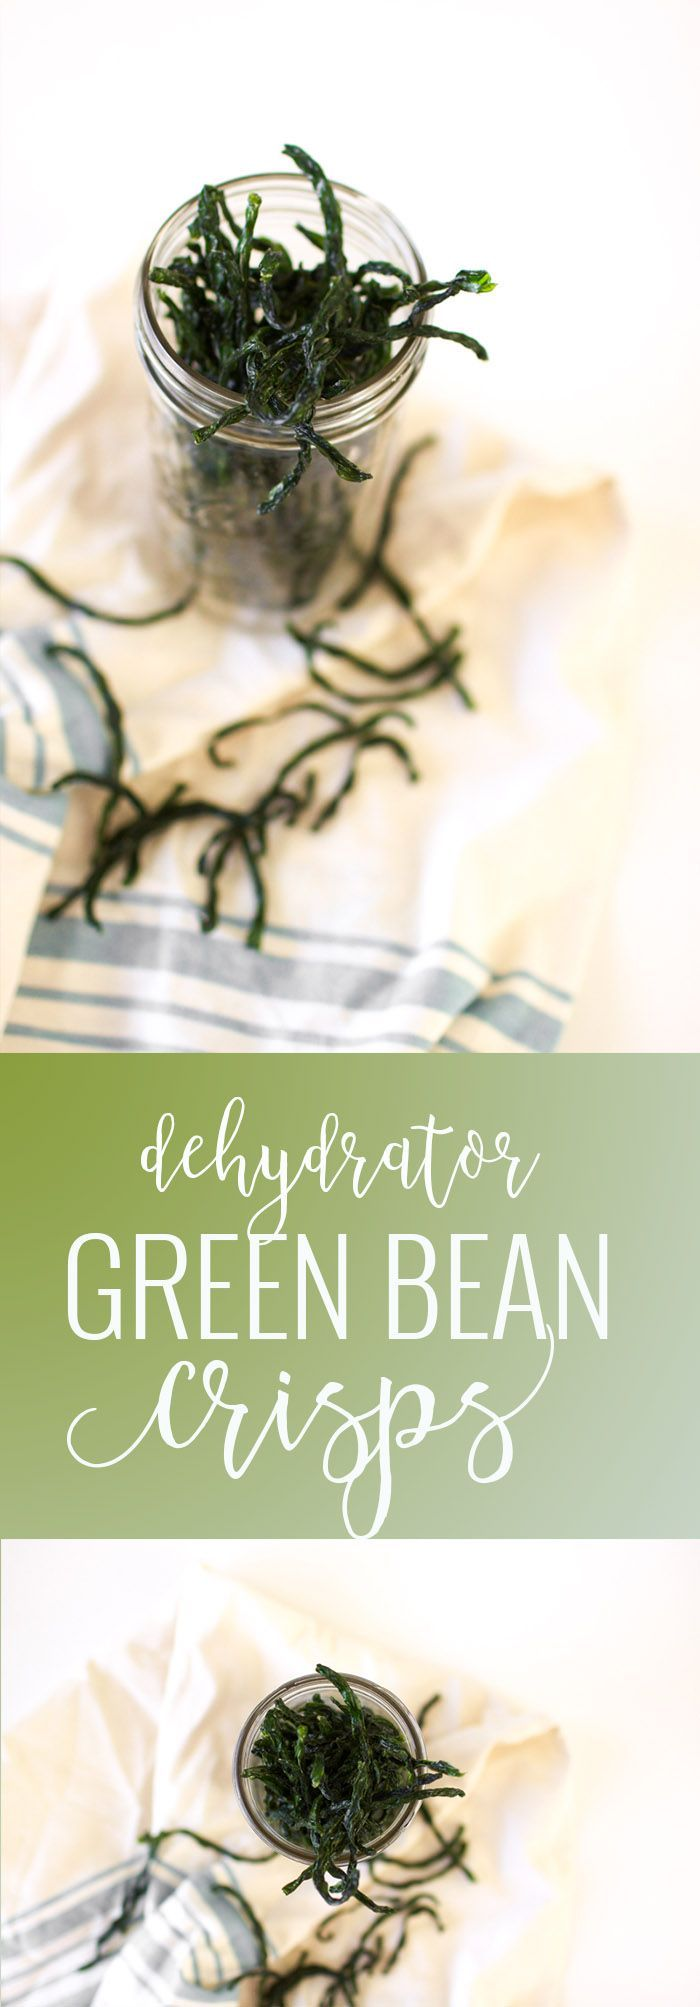 Green Bean Crisps | healthy snack recipes | healthy green bean recipes | recipes for green beans | dehydrated vegetable recipes | healthy chip recipes | healthy vegetable recipes | green bean recipe ideas || Oh So Delicioso